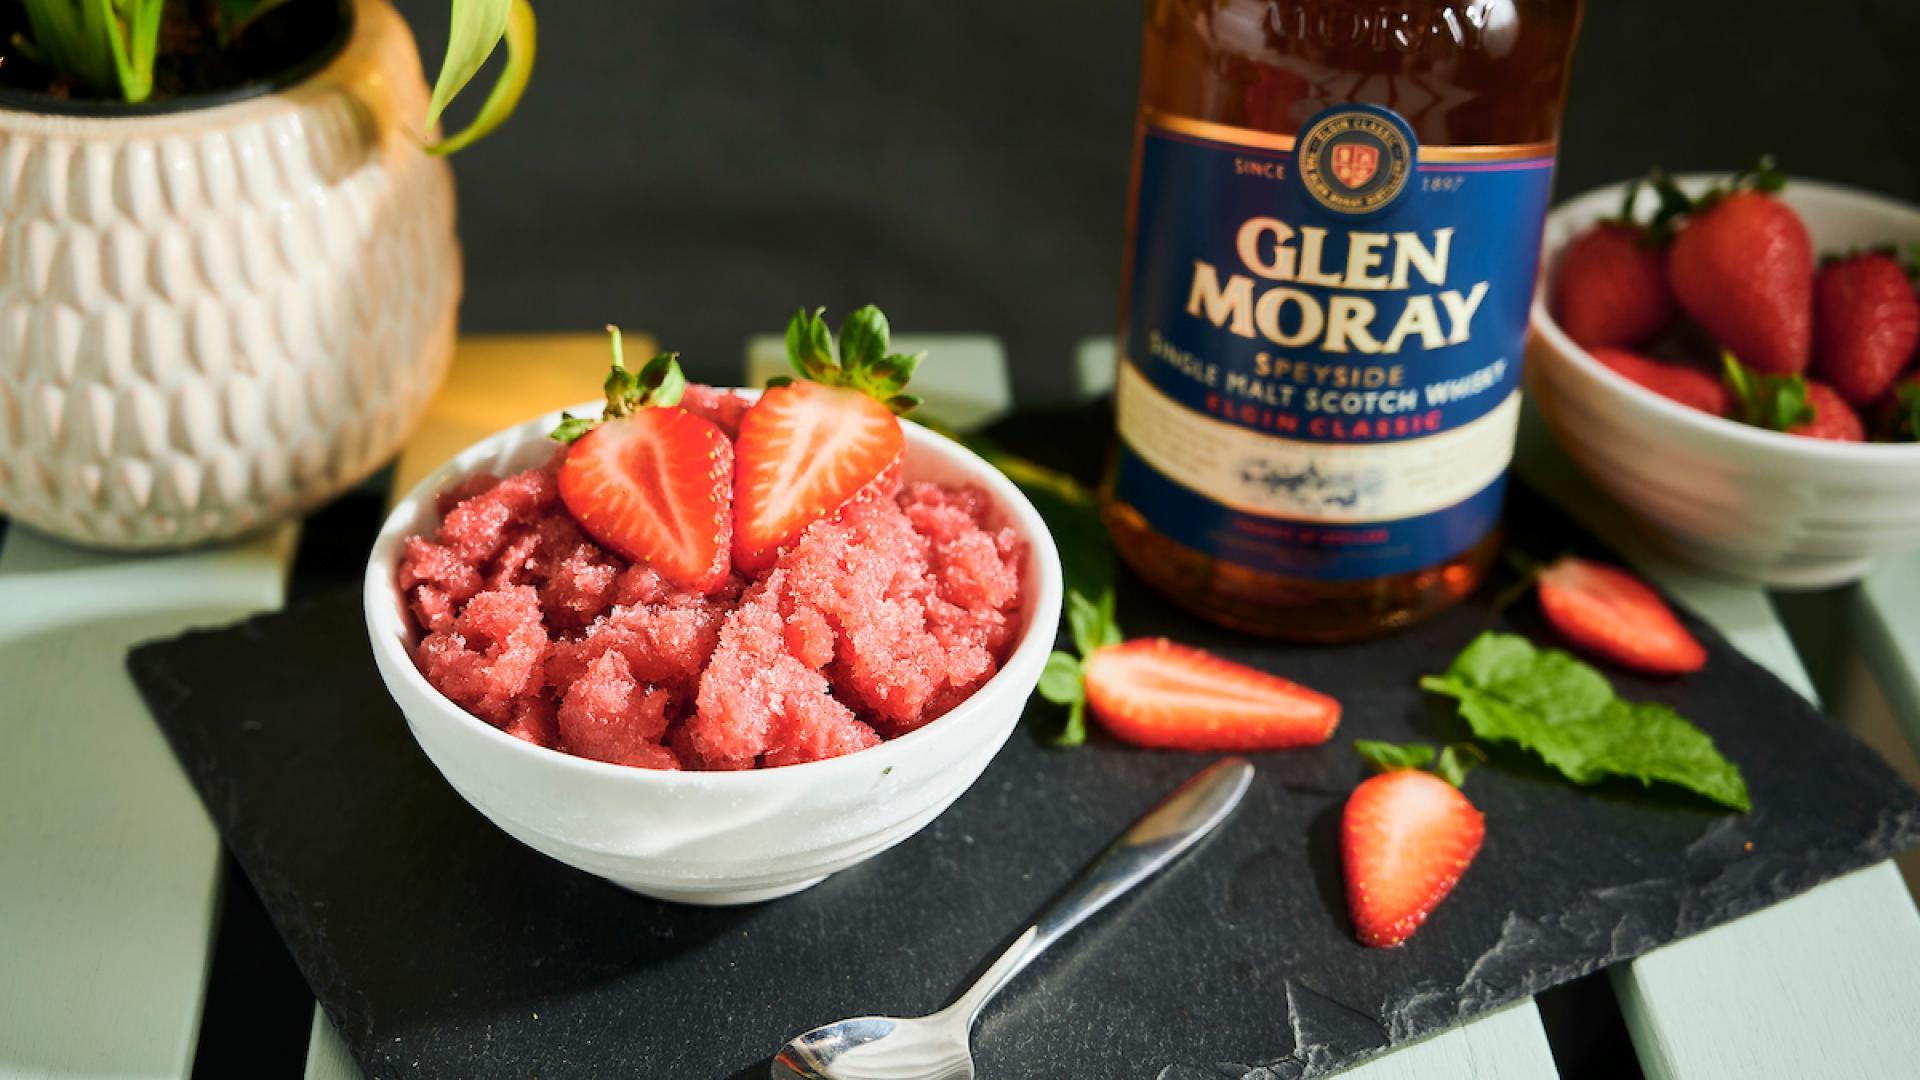 Glenn Moray strawberry daiquiri granita